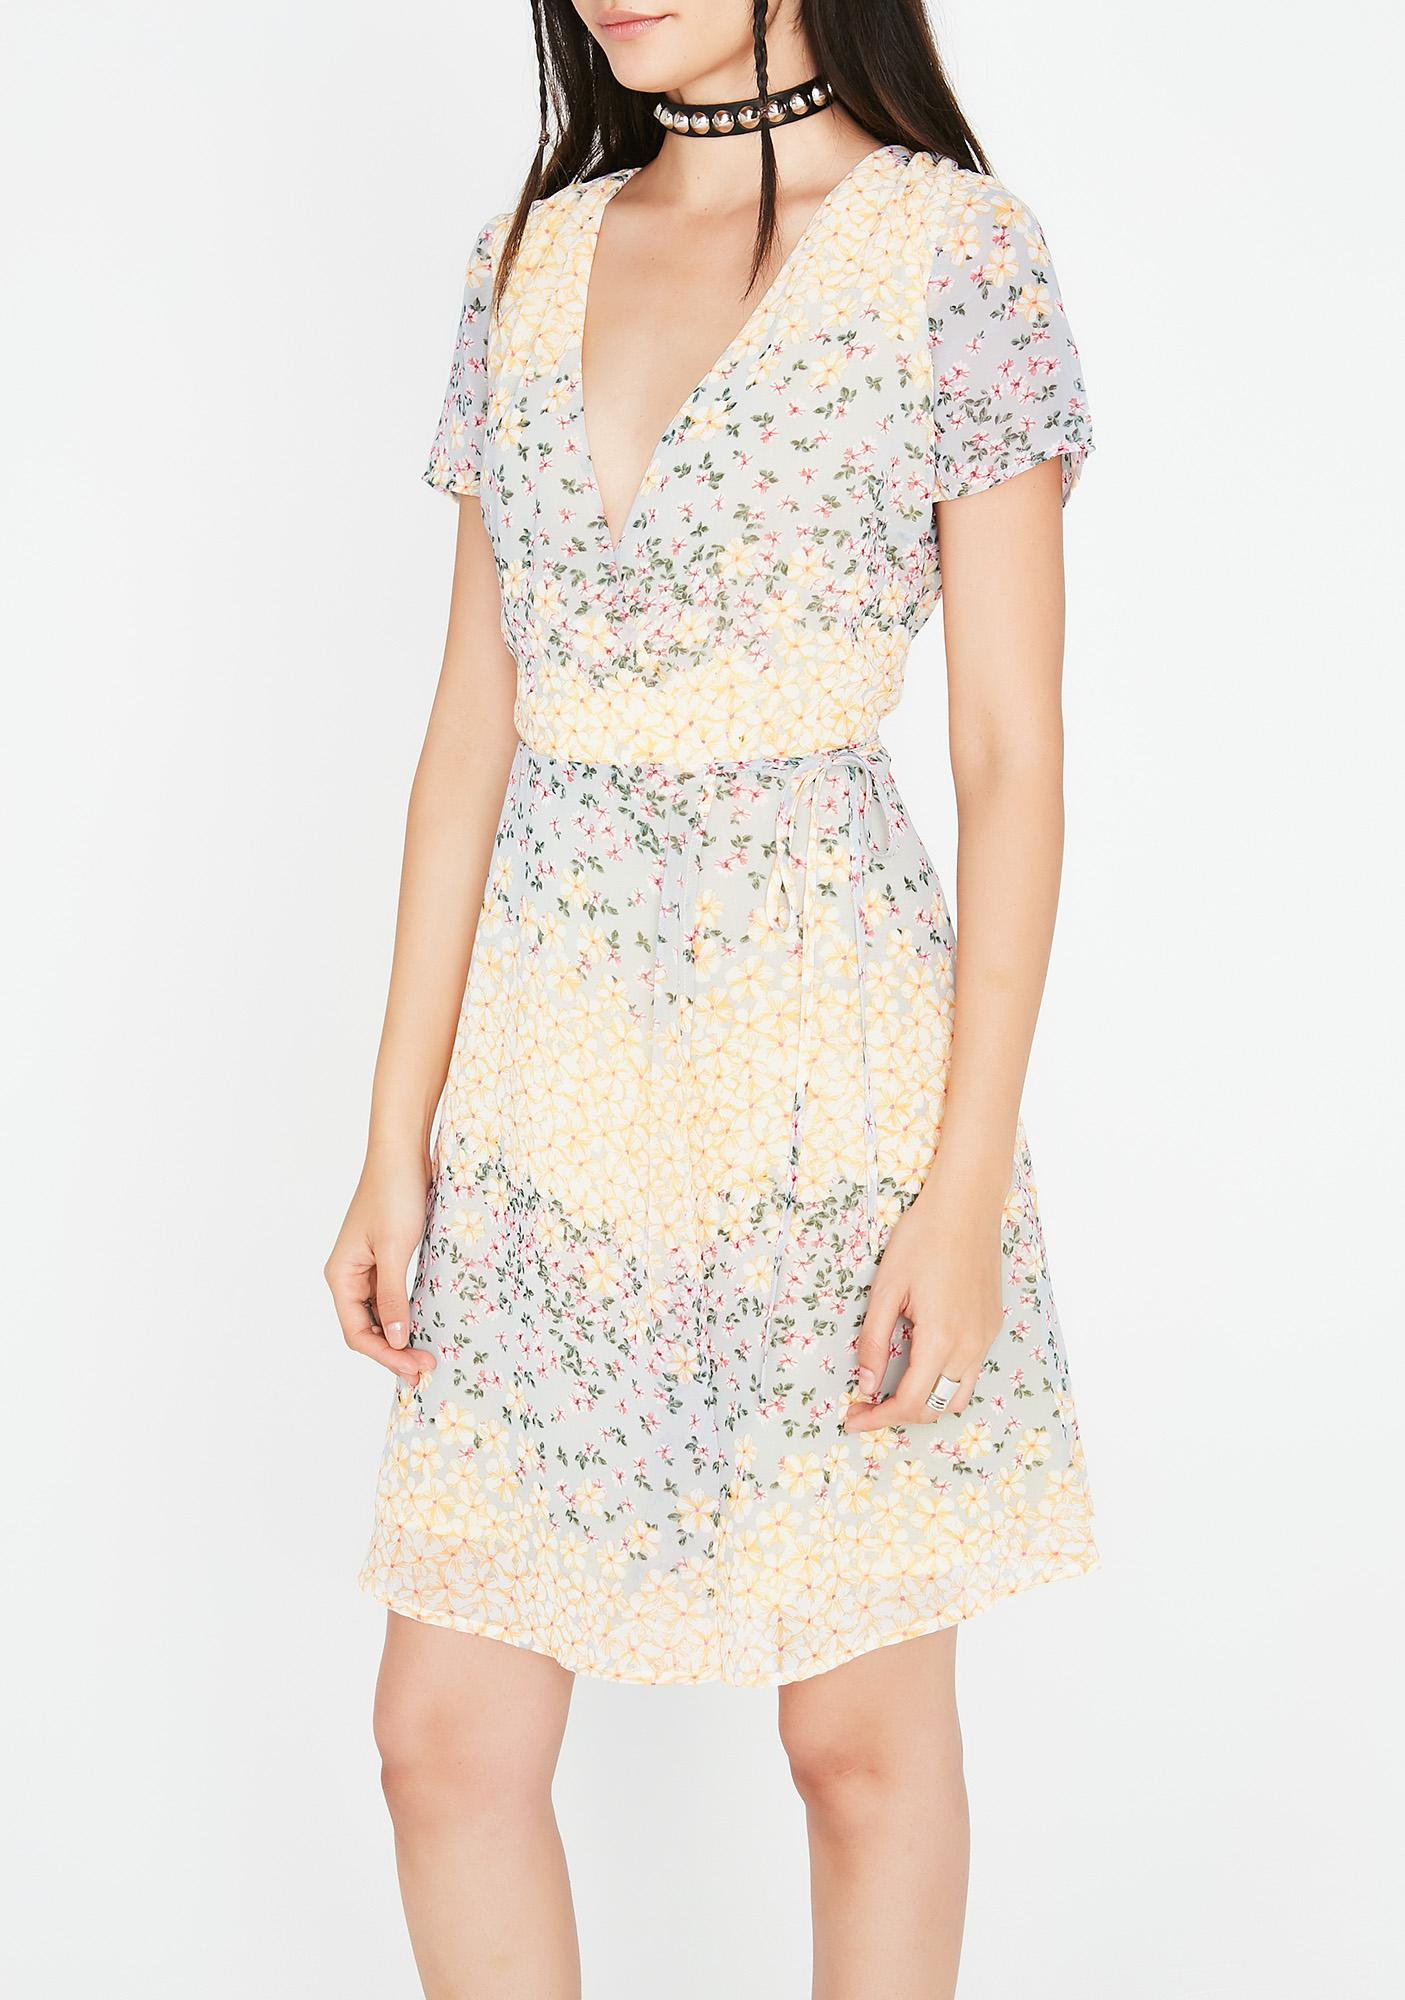 Ever More Floral Dress